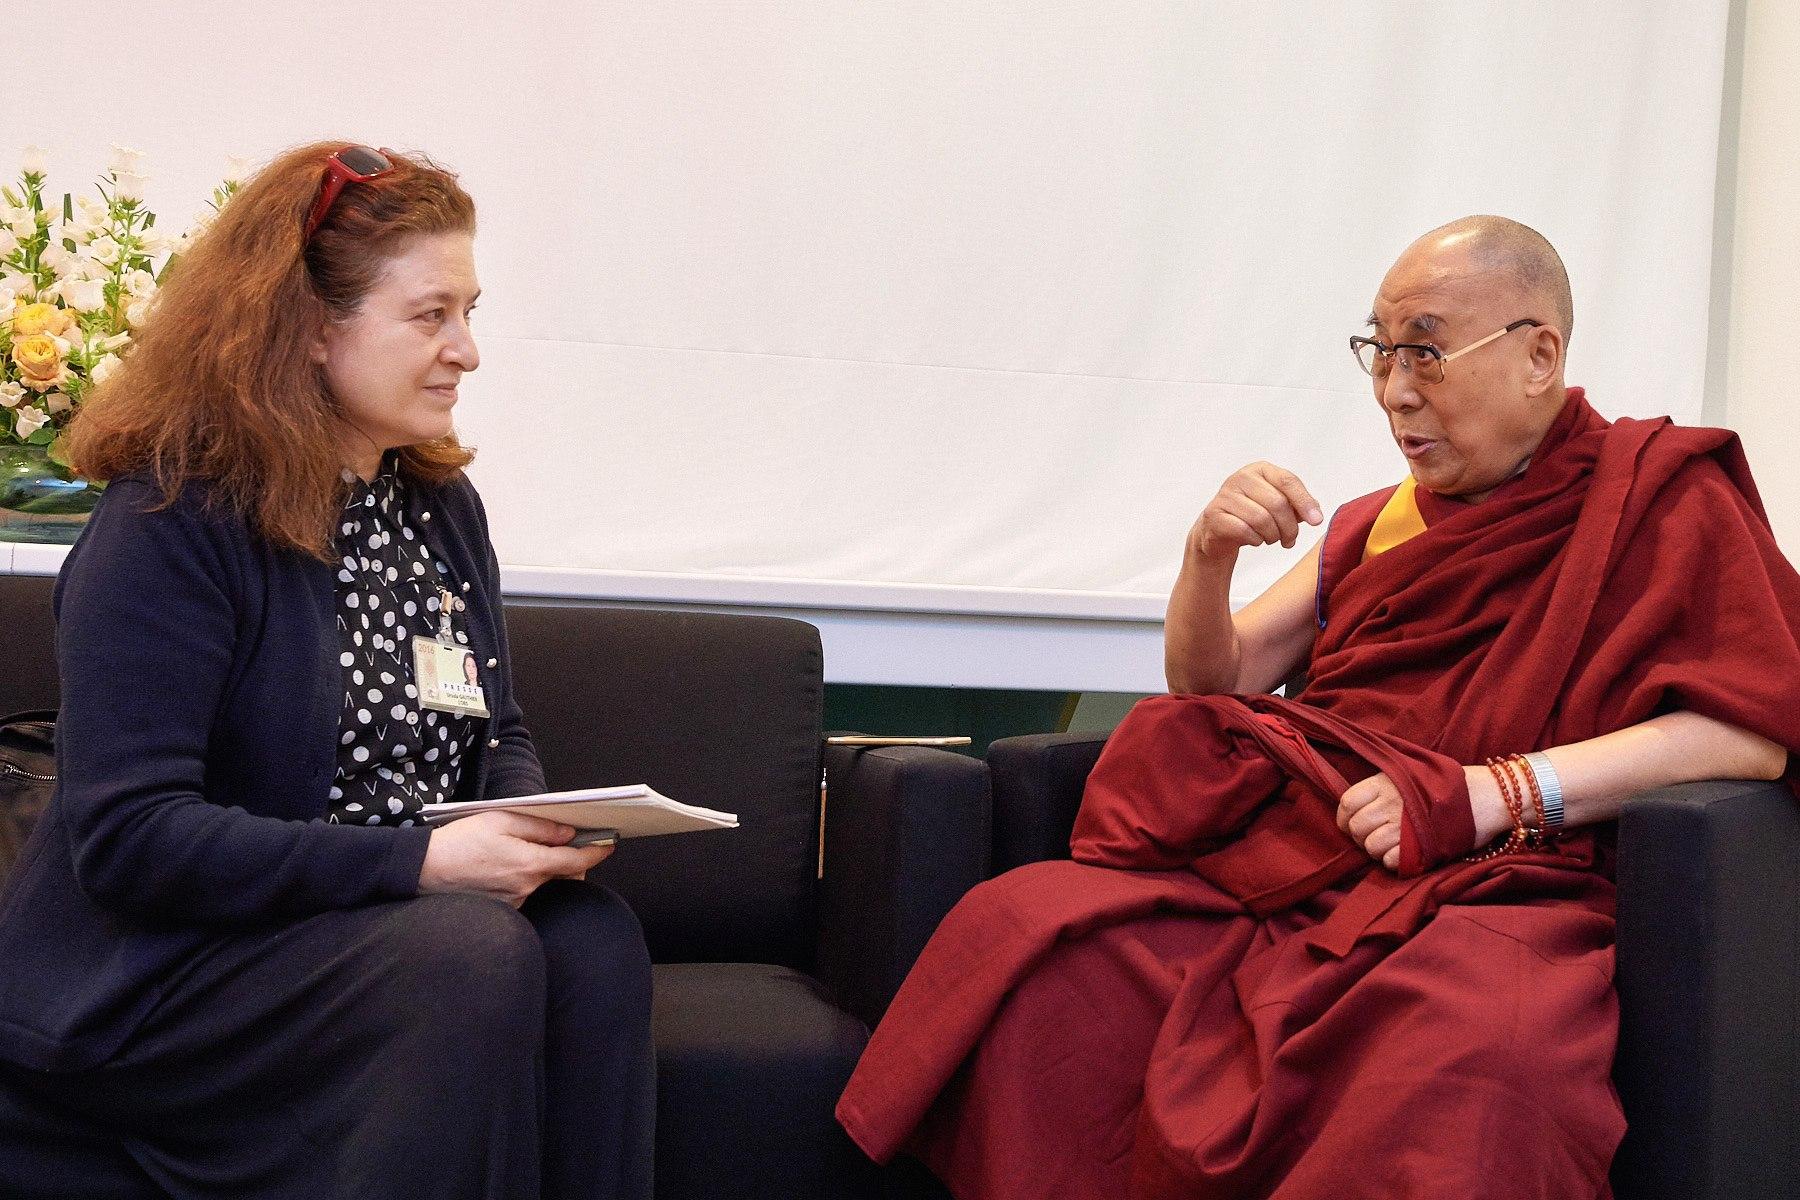 Ursula_gauthier_Dalai_lama